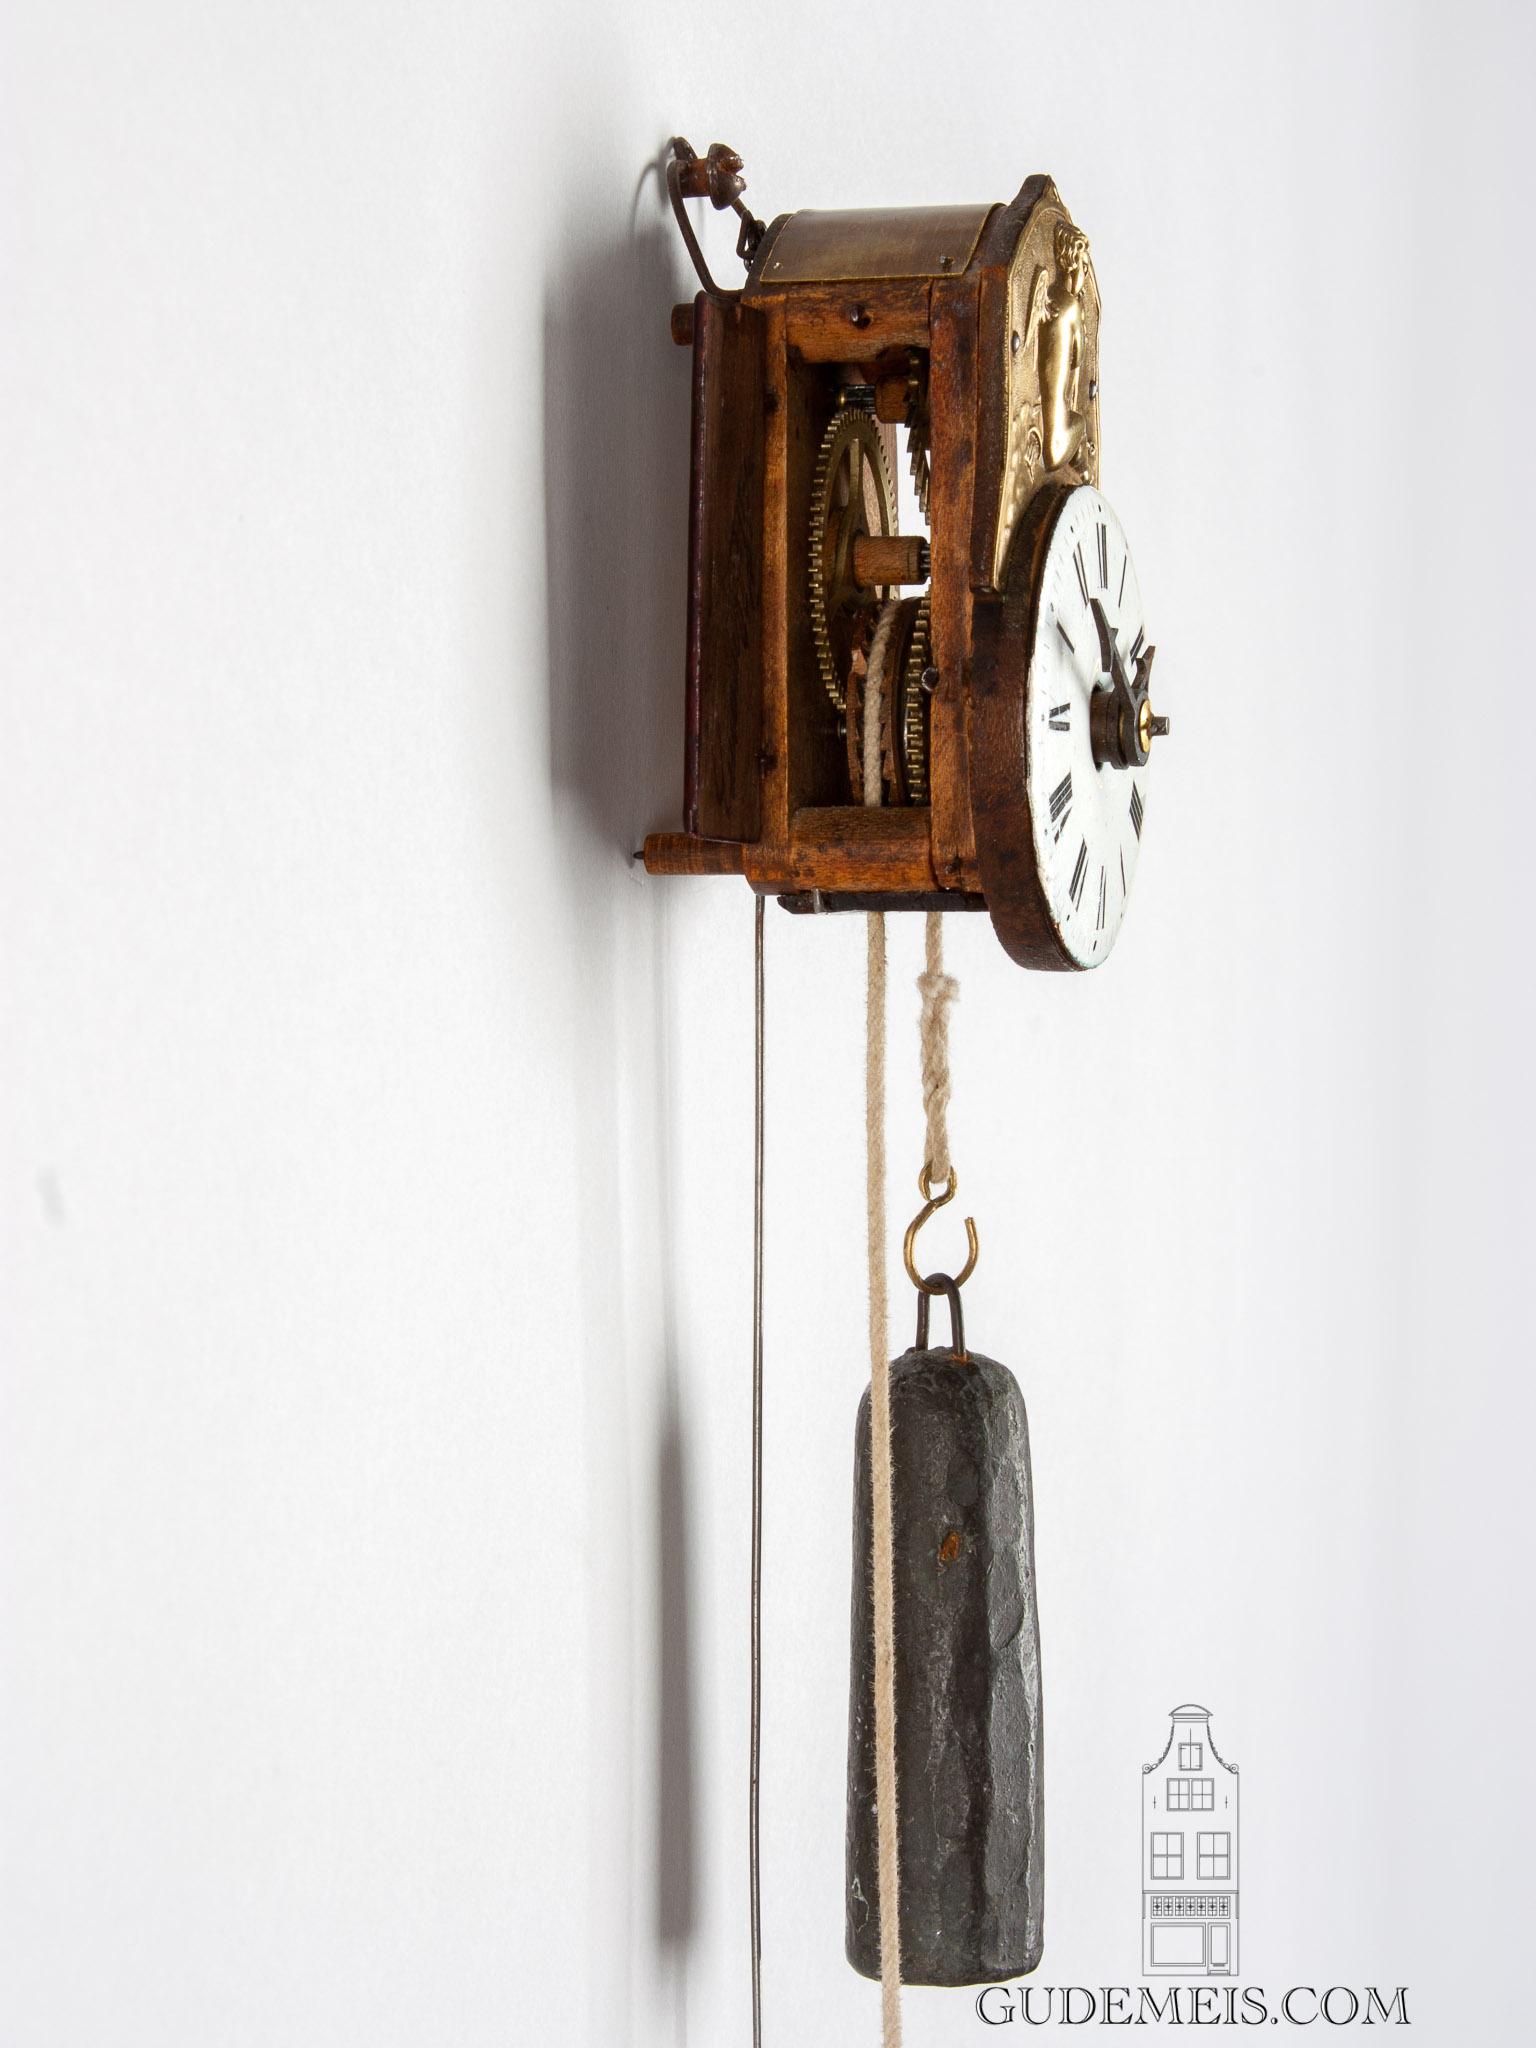 German-Schwarzwald-Black-Forest-miniature-wood-sorg-wall-clock-neustadt